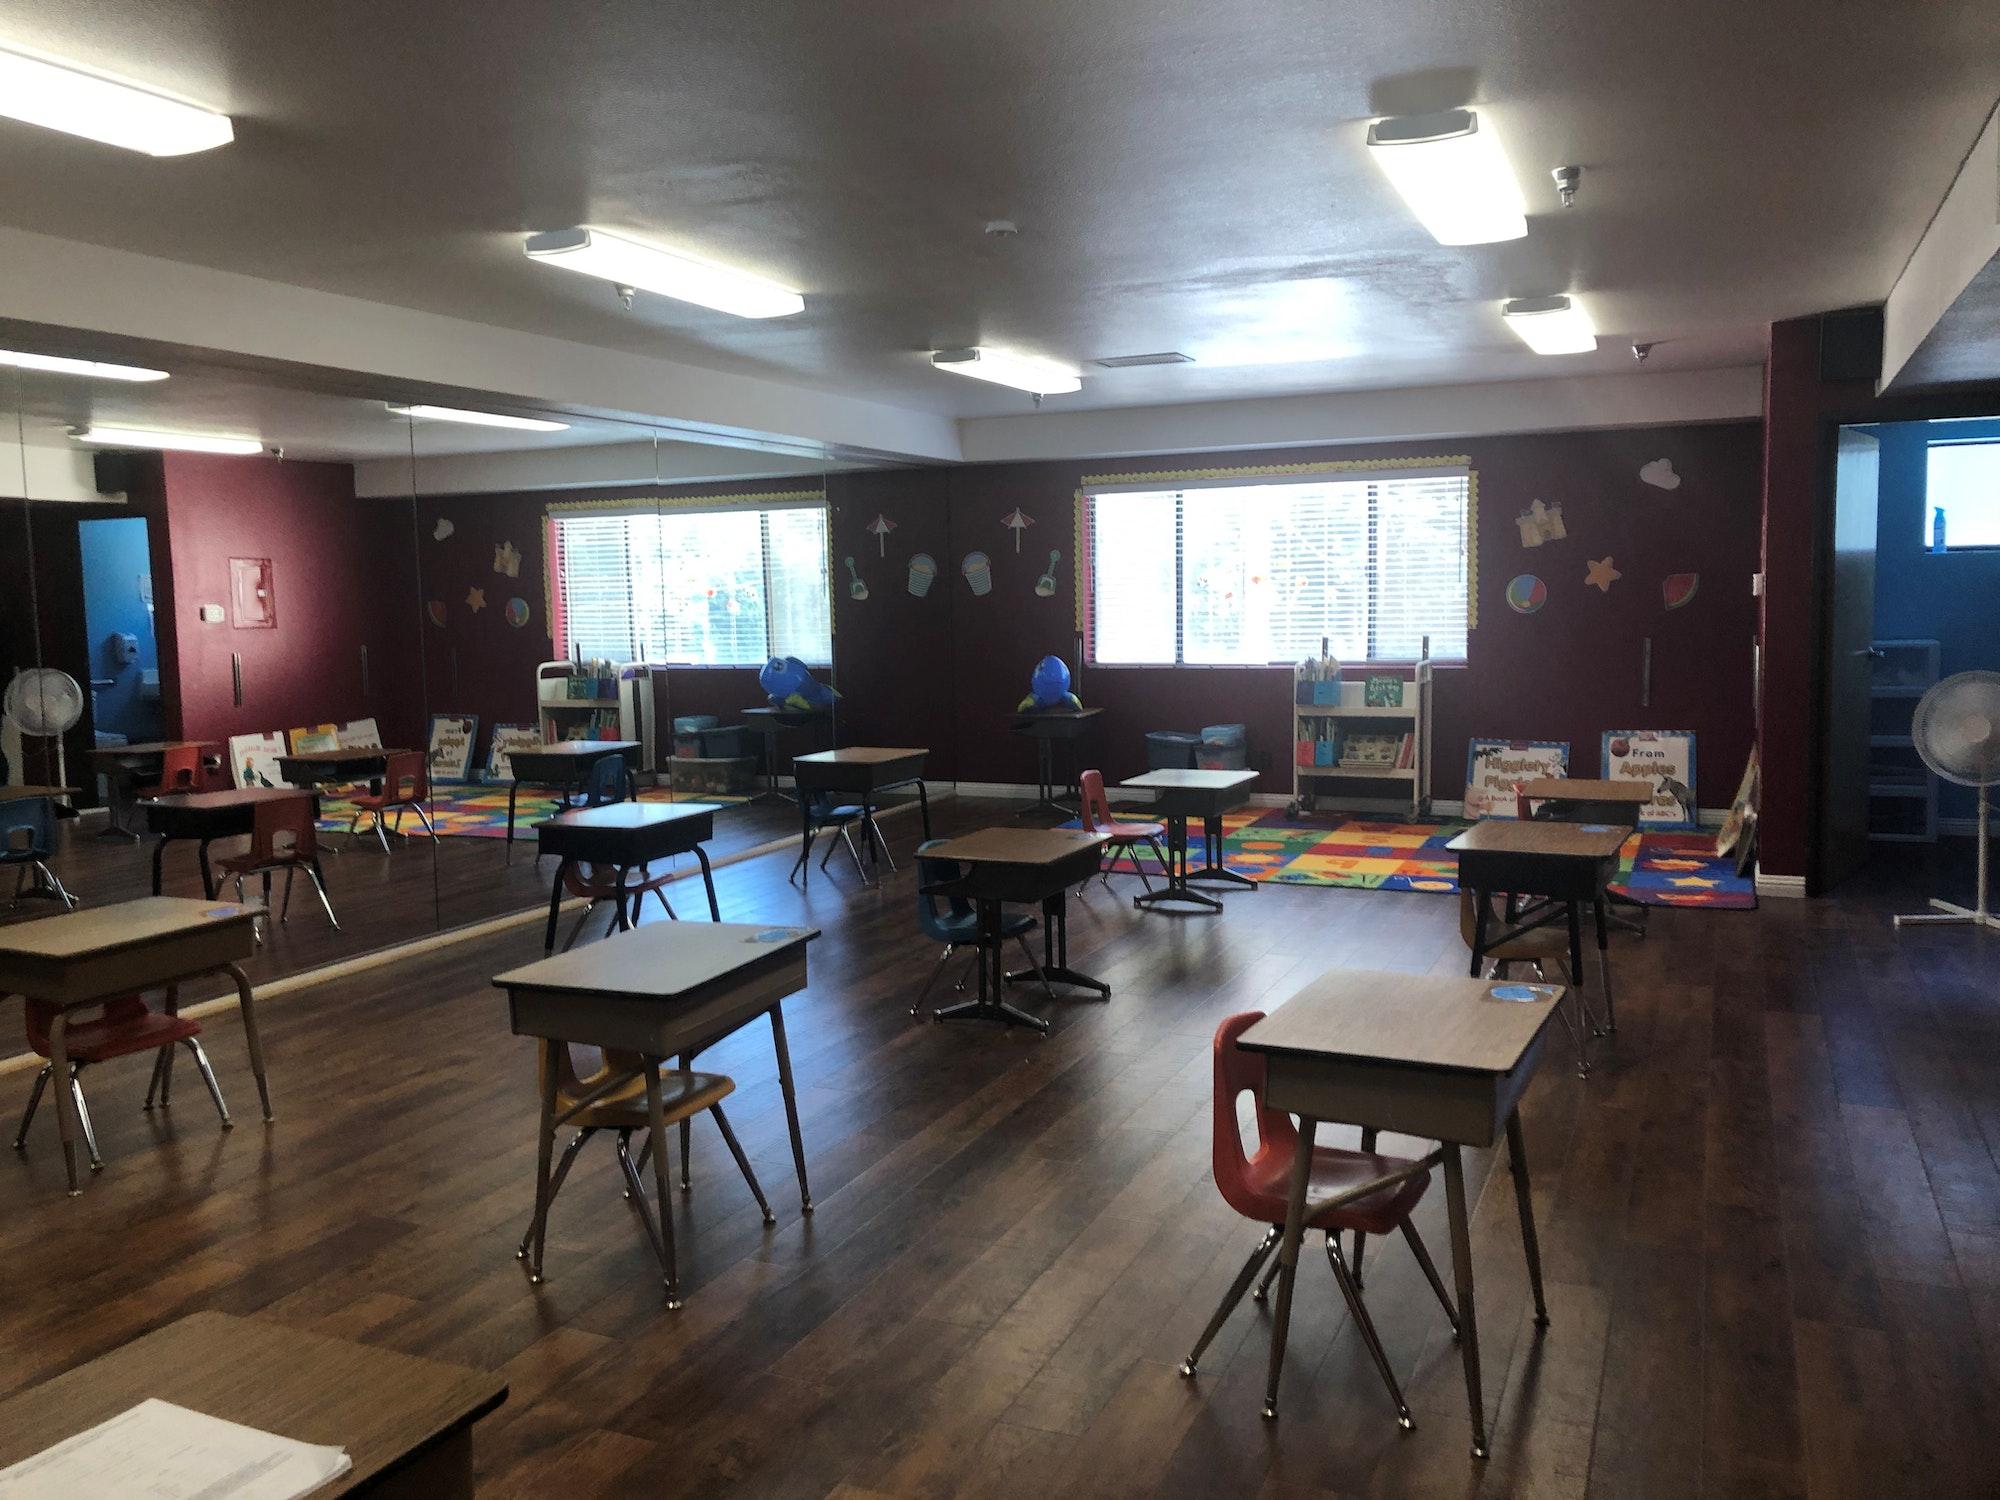 Kinder Enrichment Center in Dance & Fitness Studio, Rimforest, CA